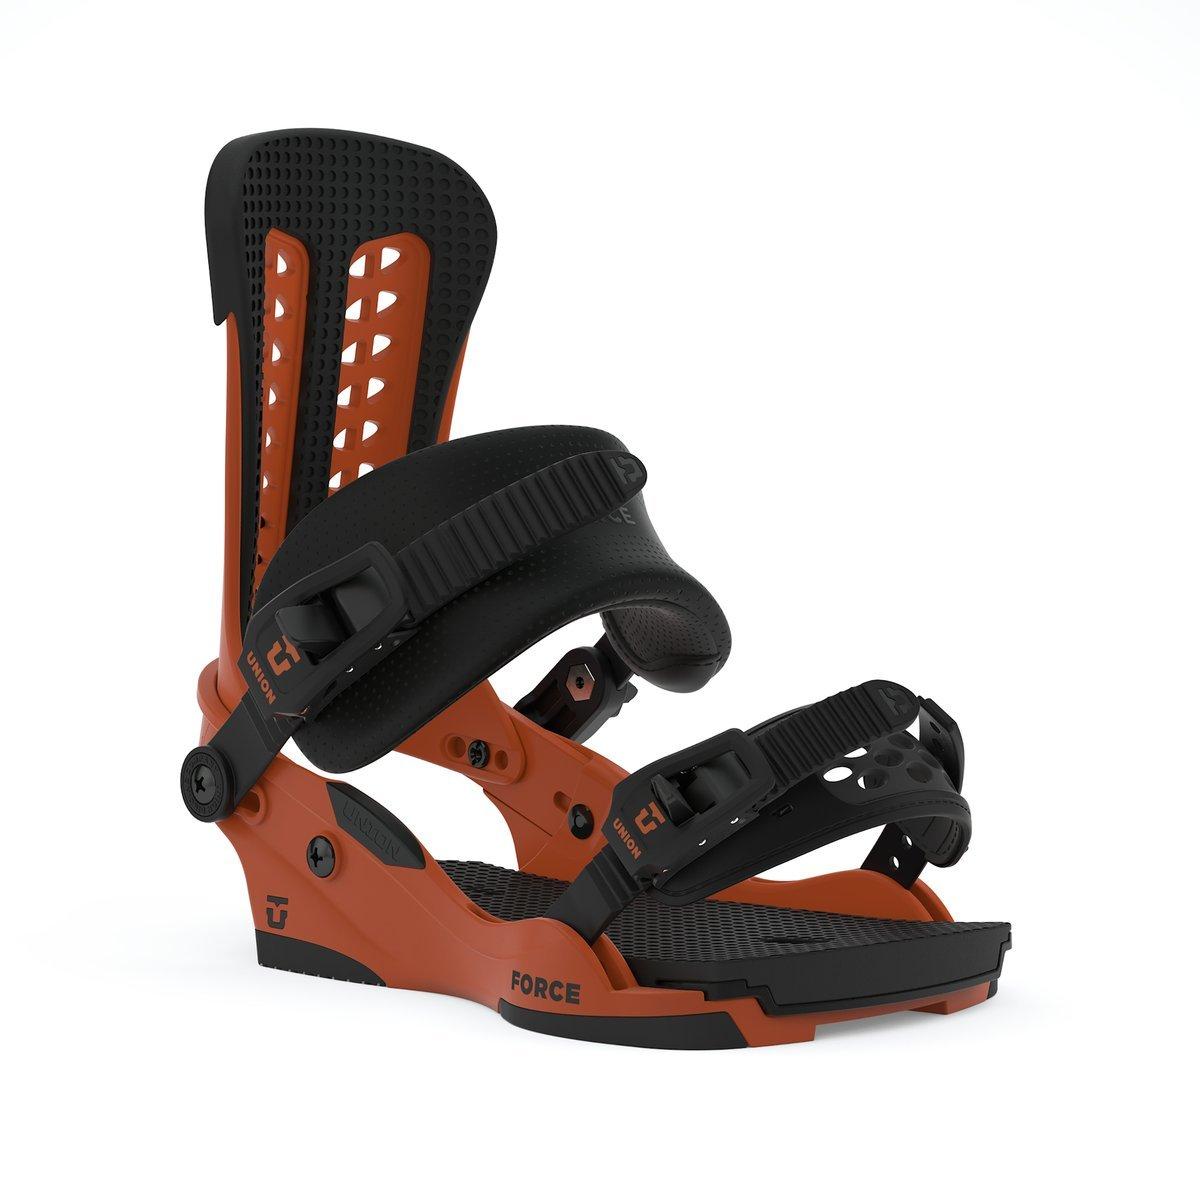 Union Force Snowboard Bindings - Burnt Orange